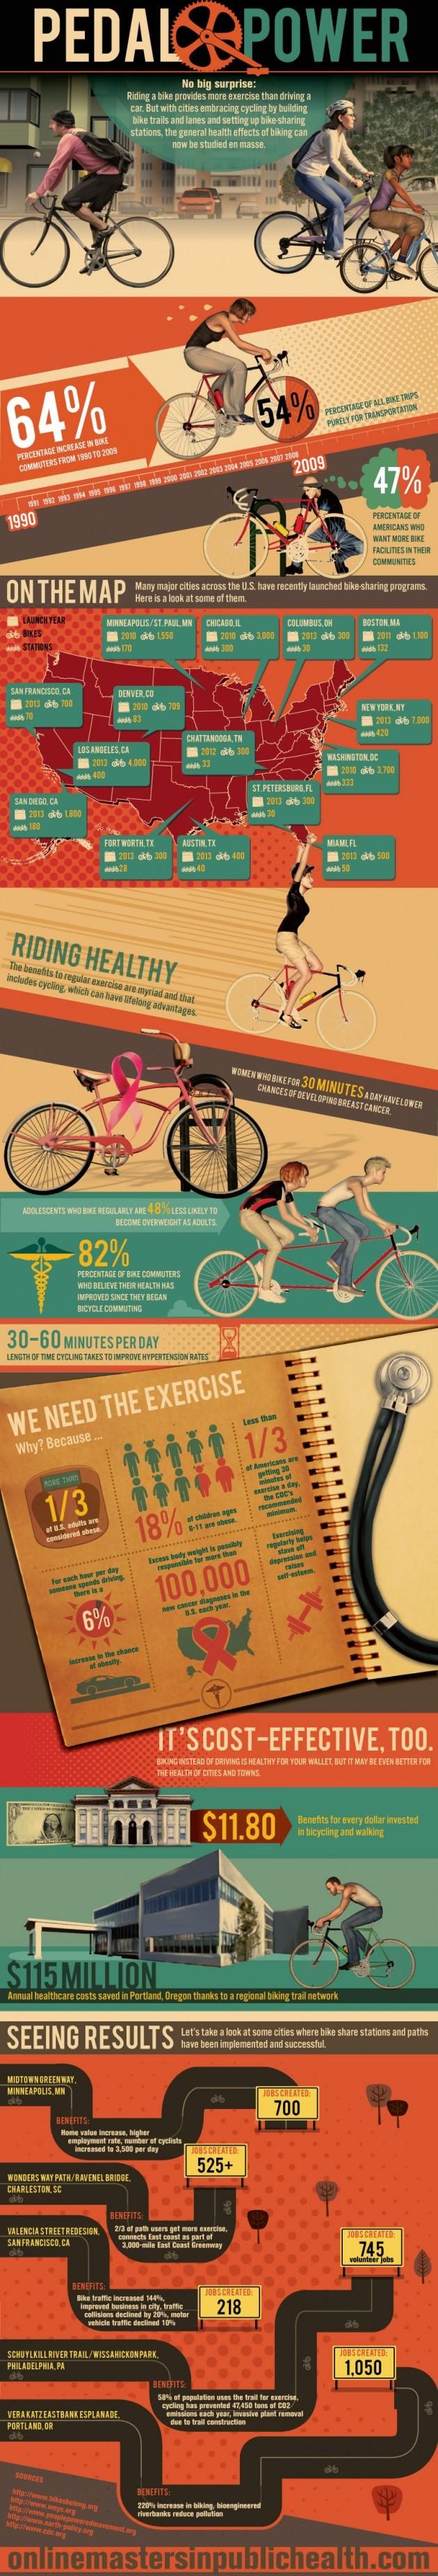 bike-friendly-city